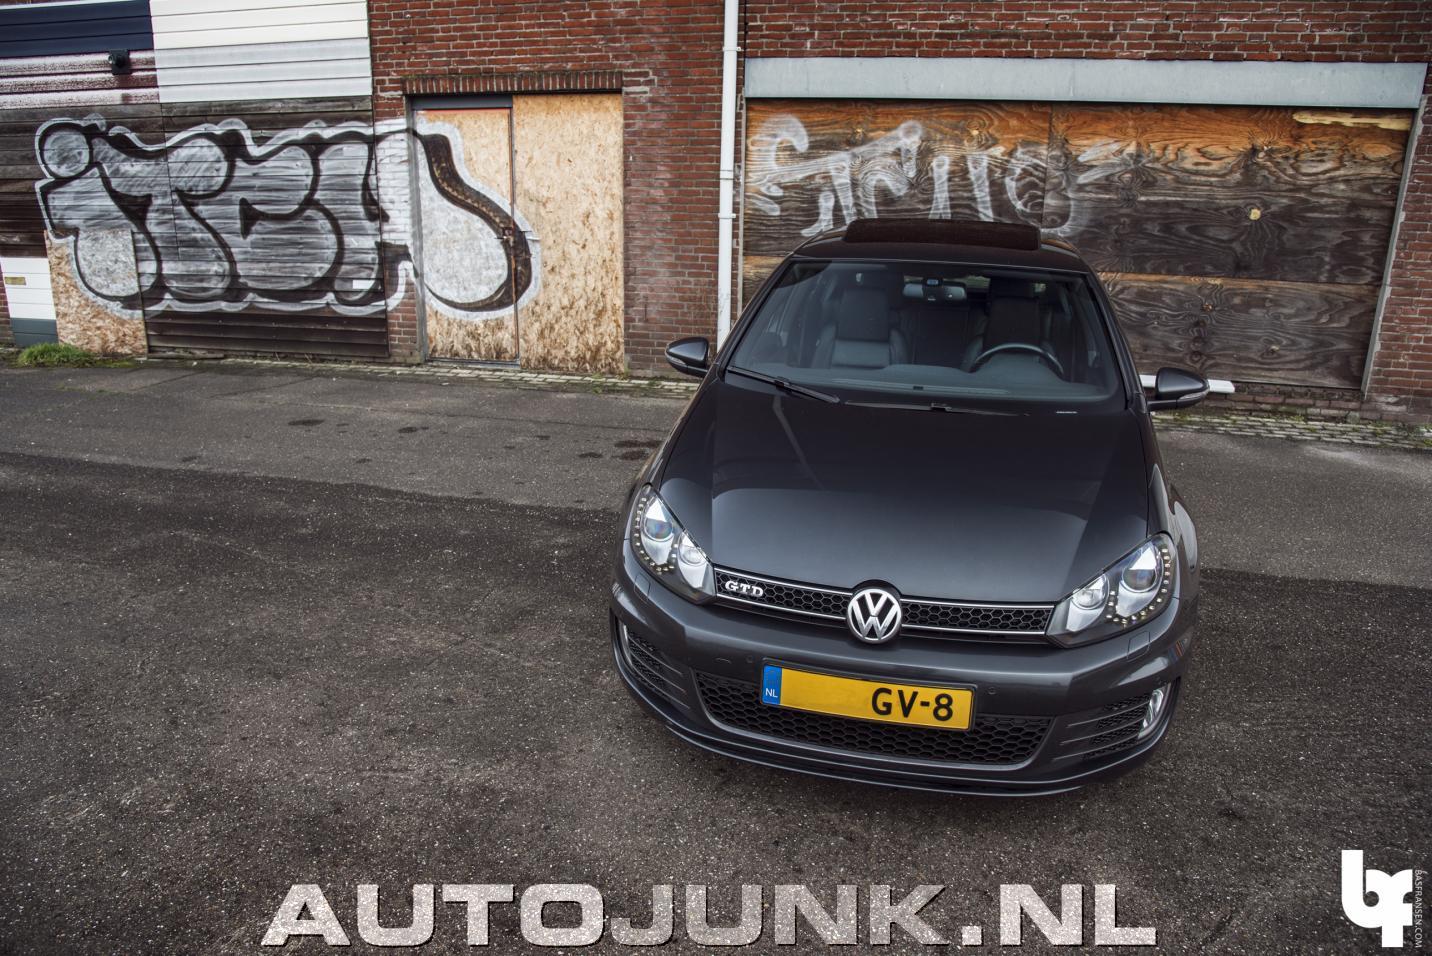 Mijn eigen Golf 6 GTD foto's » Autojunk nl (161282)